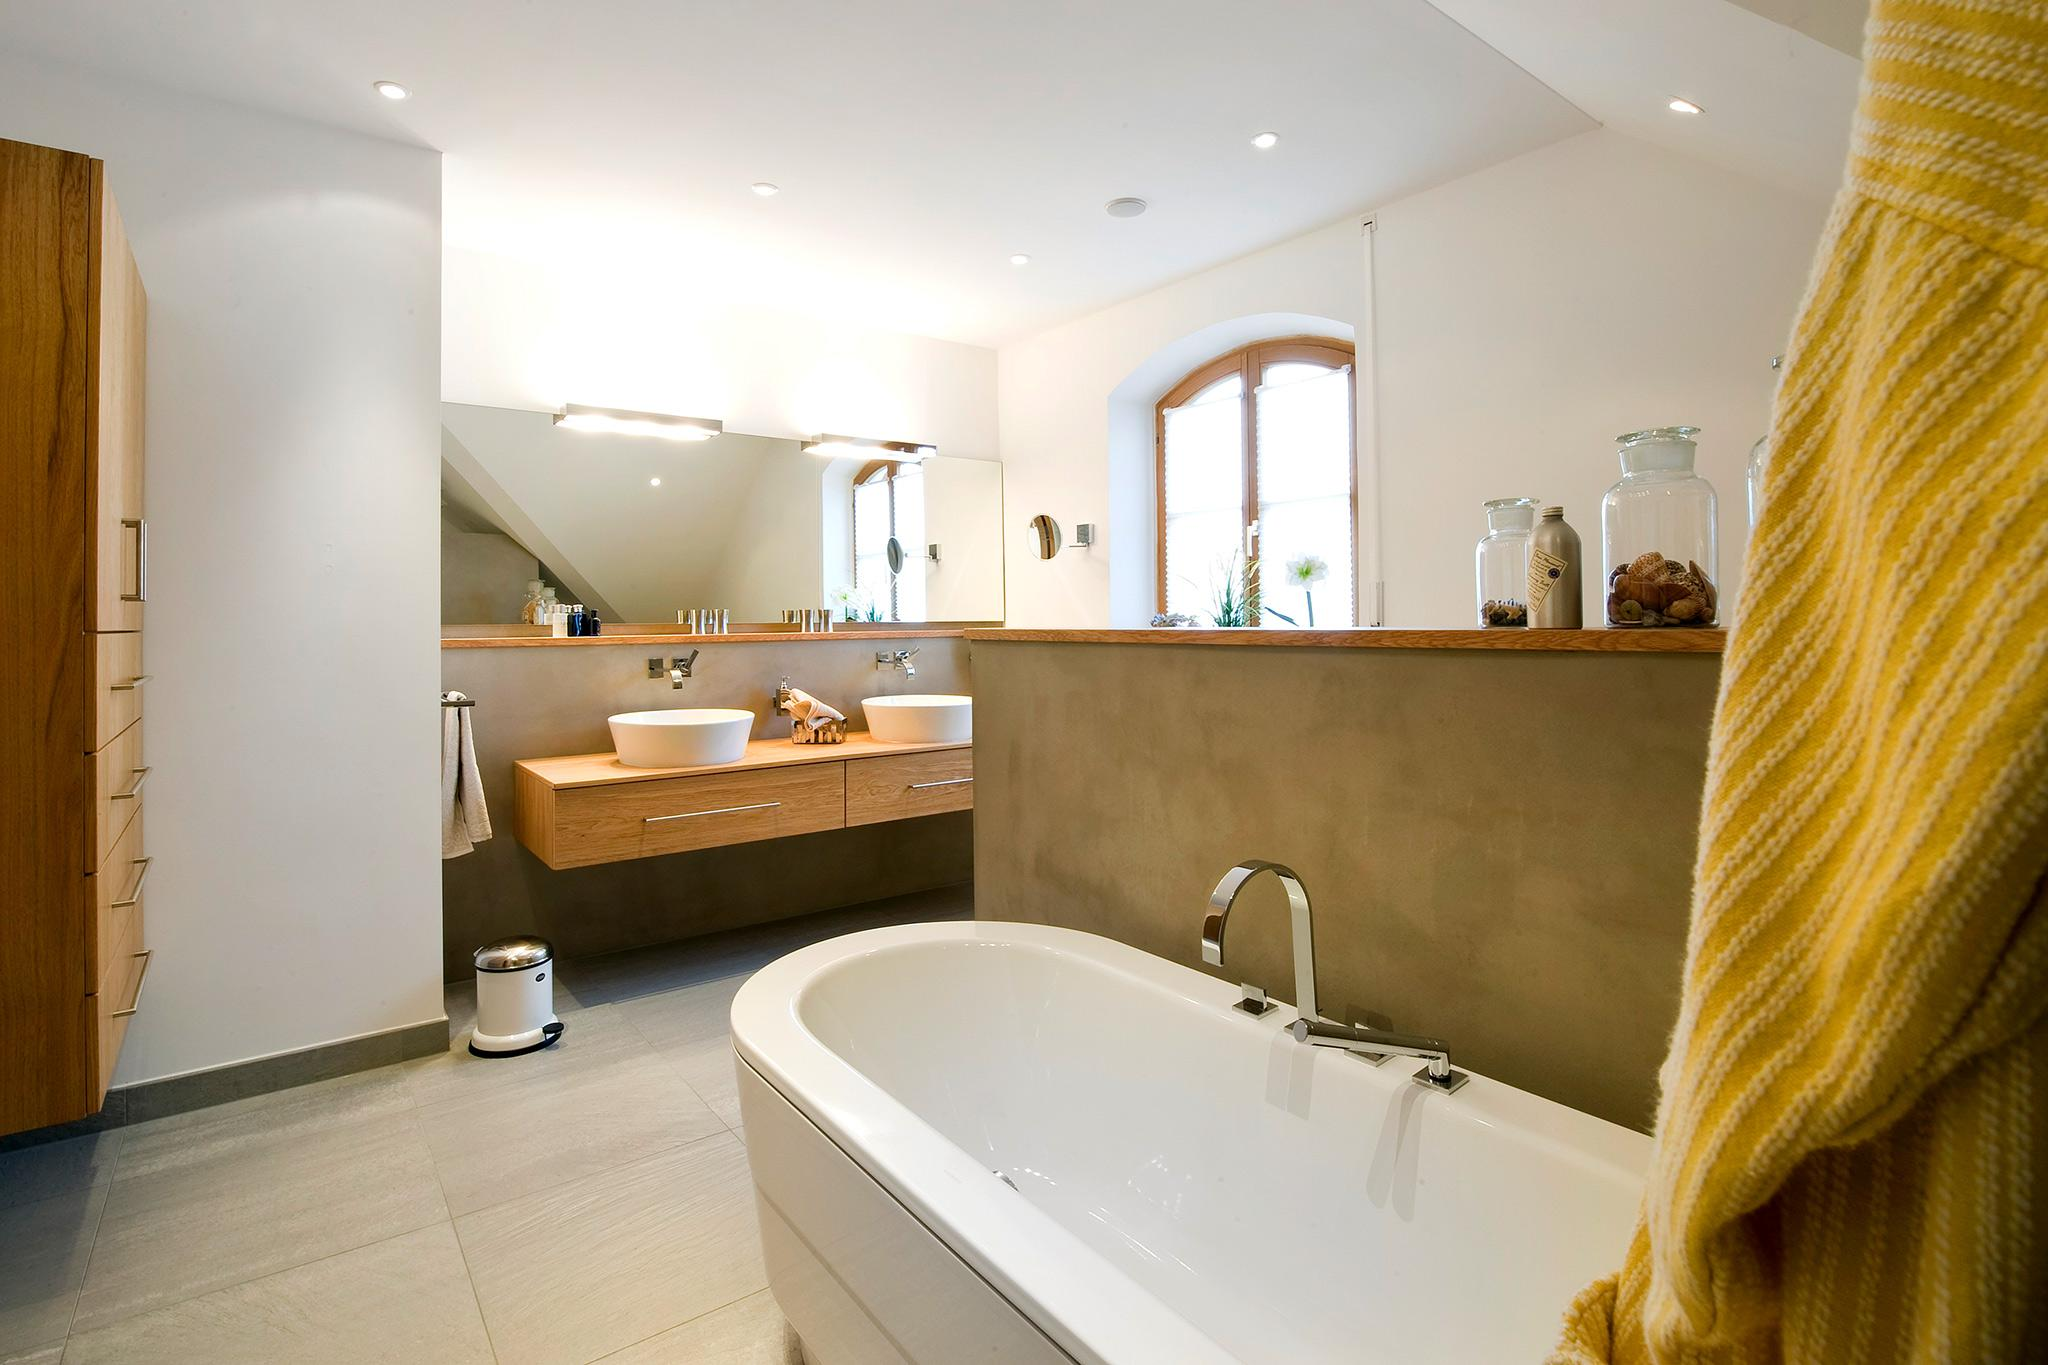 Badsanierung bilder ideen couchstyle for Badsanierung ideen